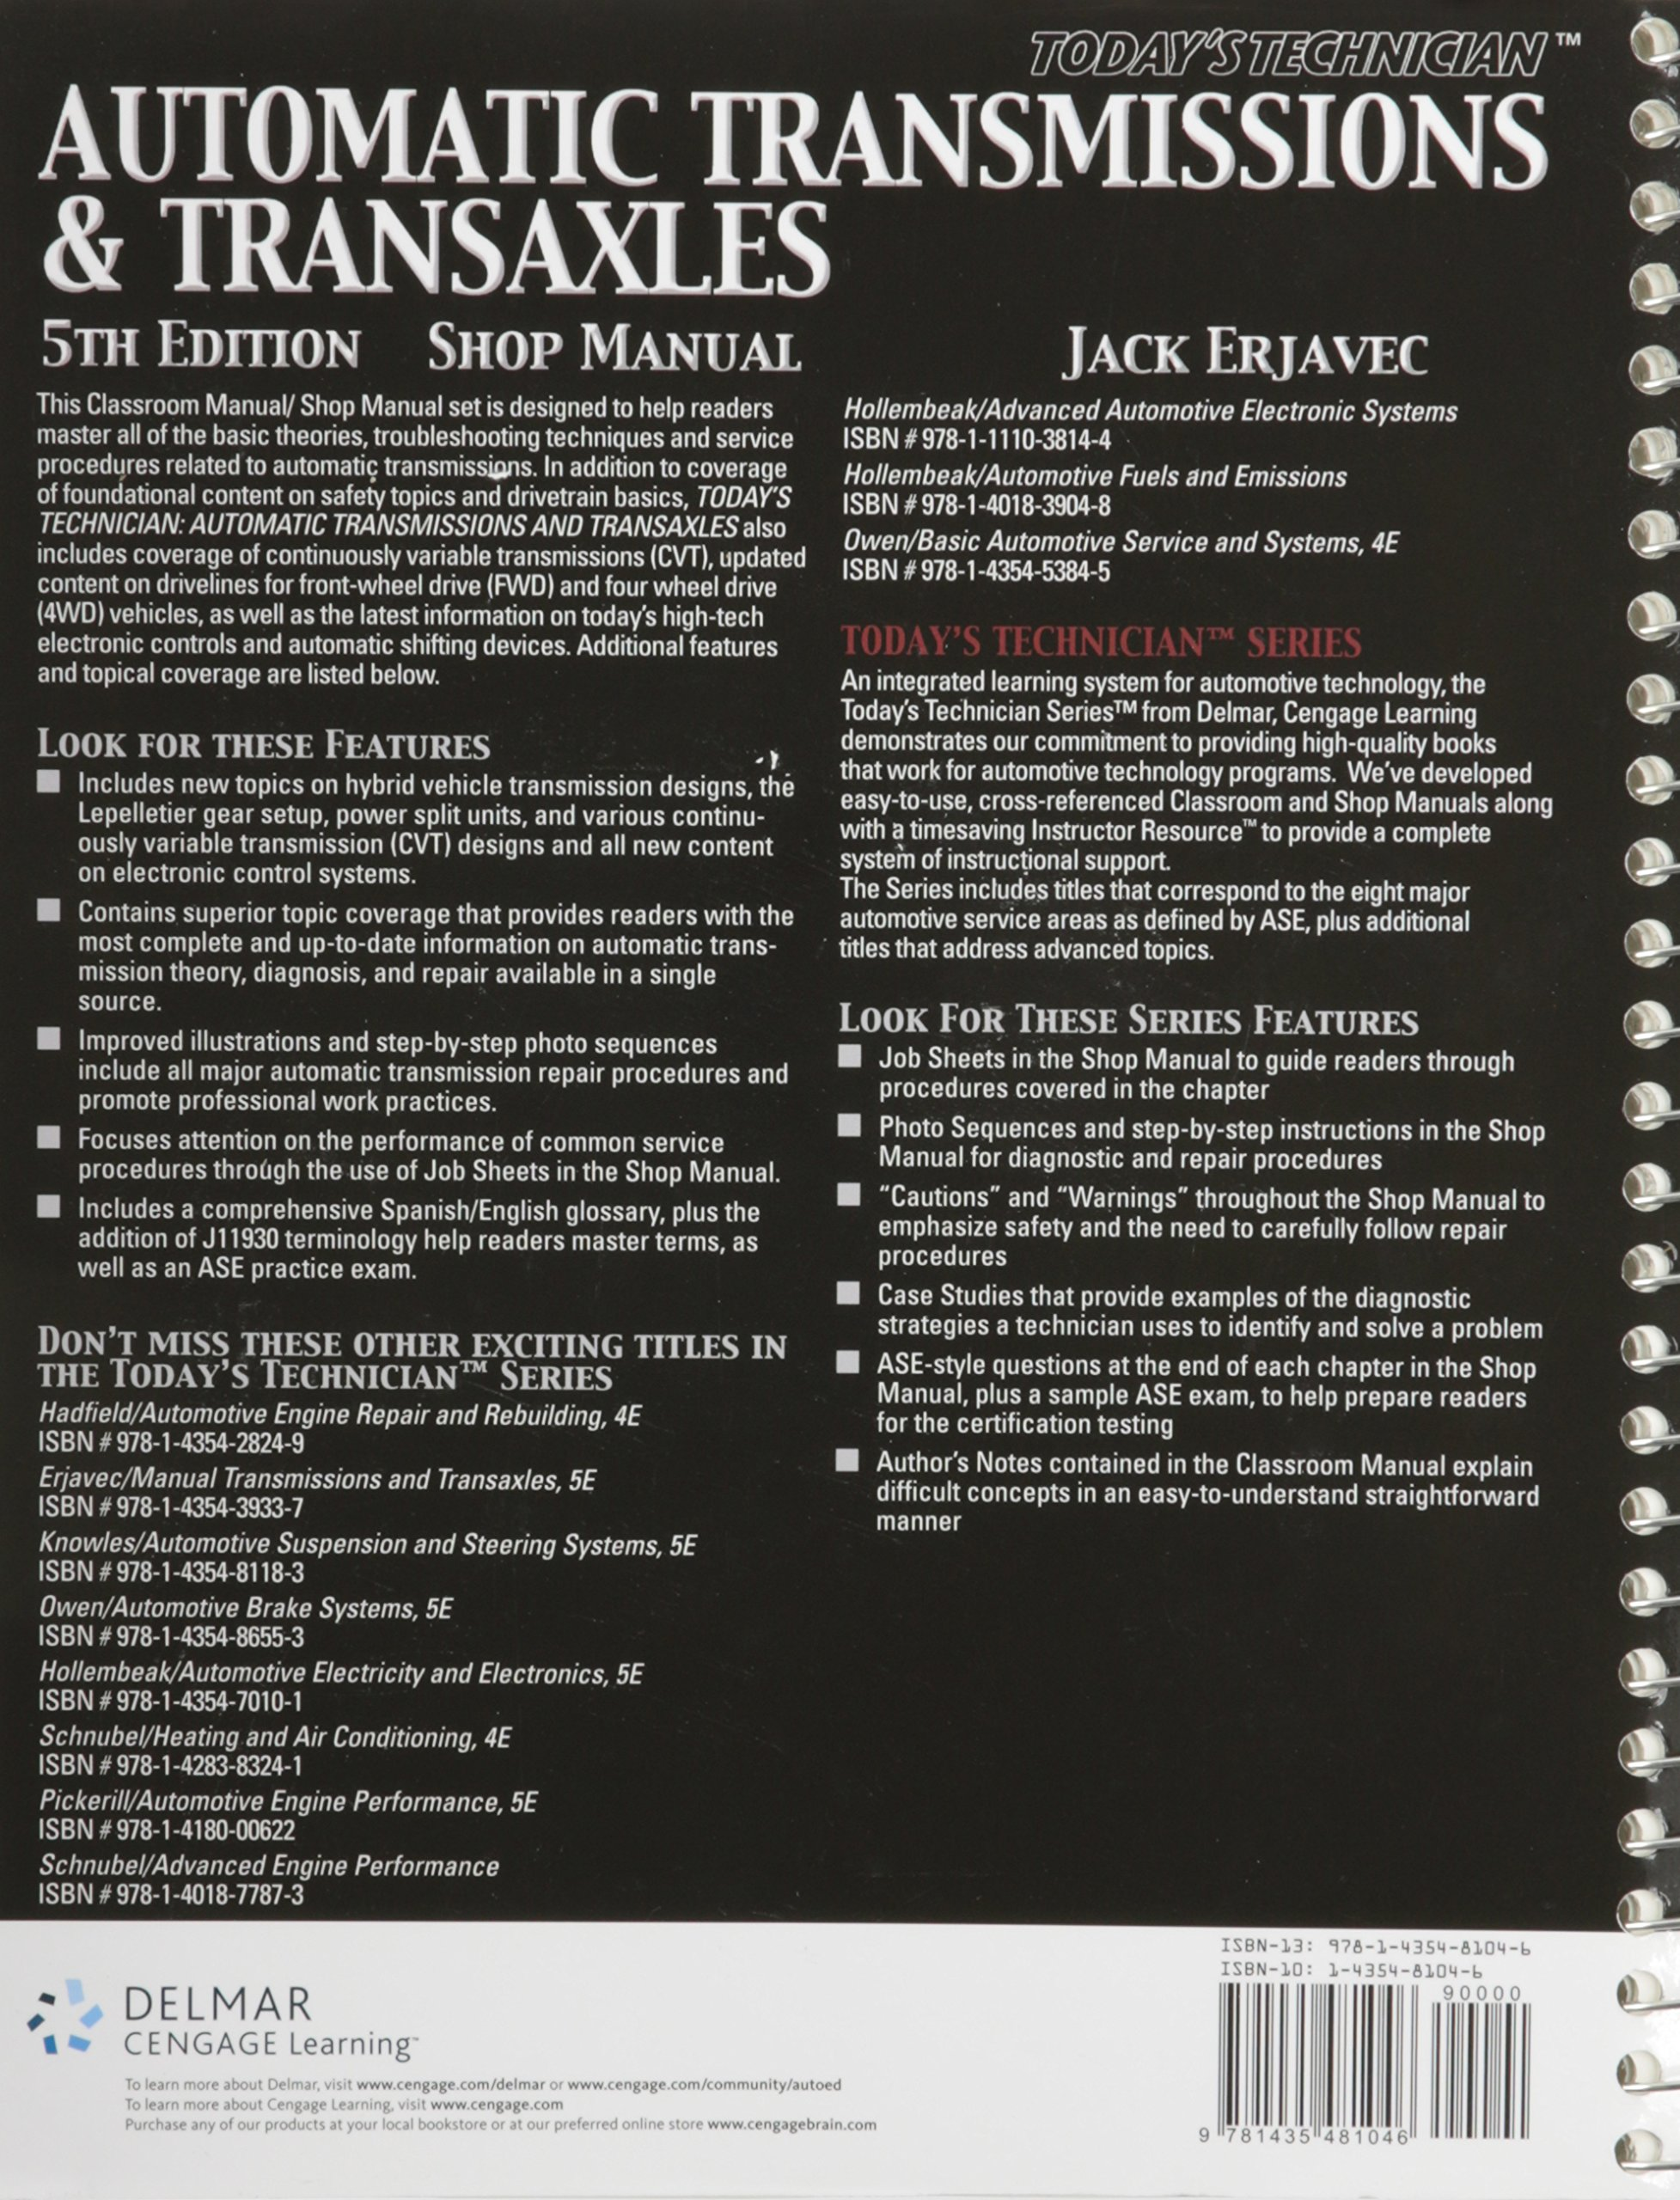 Today's Technician: Automatic Transmissions and Transaxles, Shop Manual:  Jack Erjavec: 9781435481046: Books - Amazon.ca